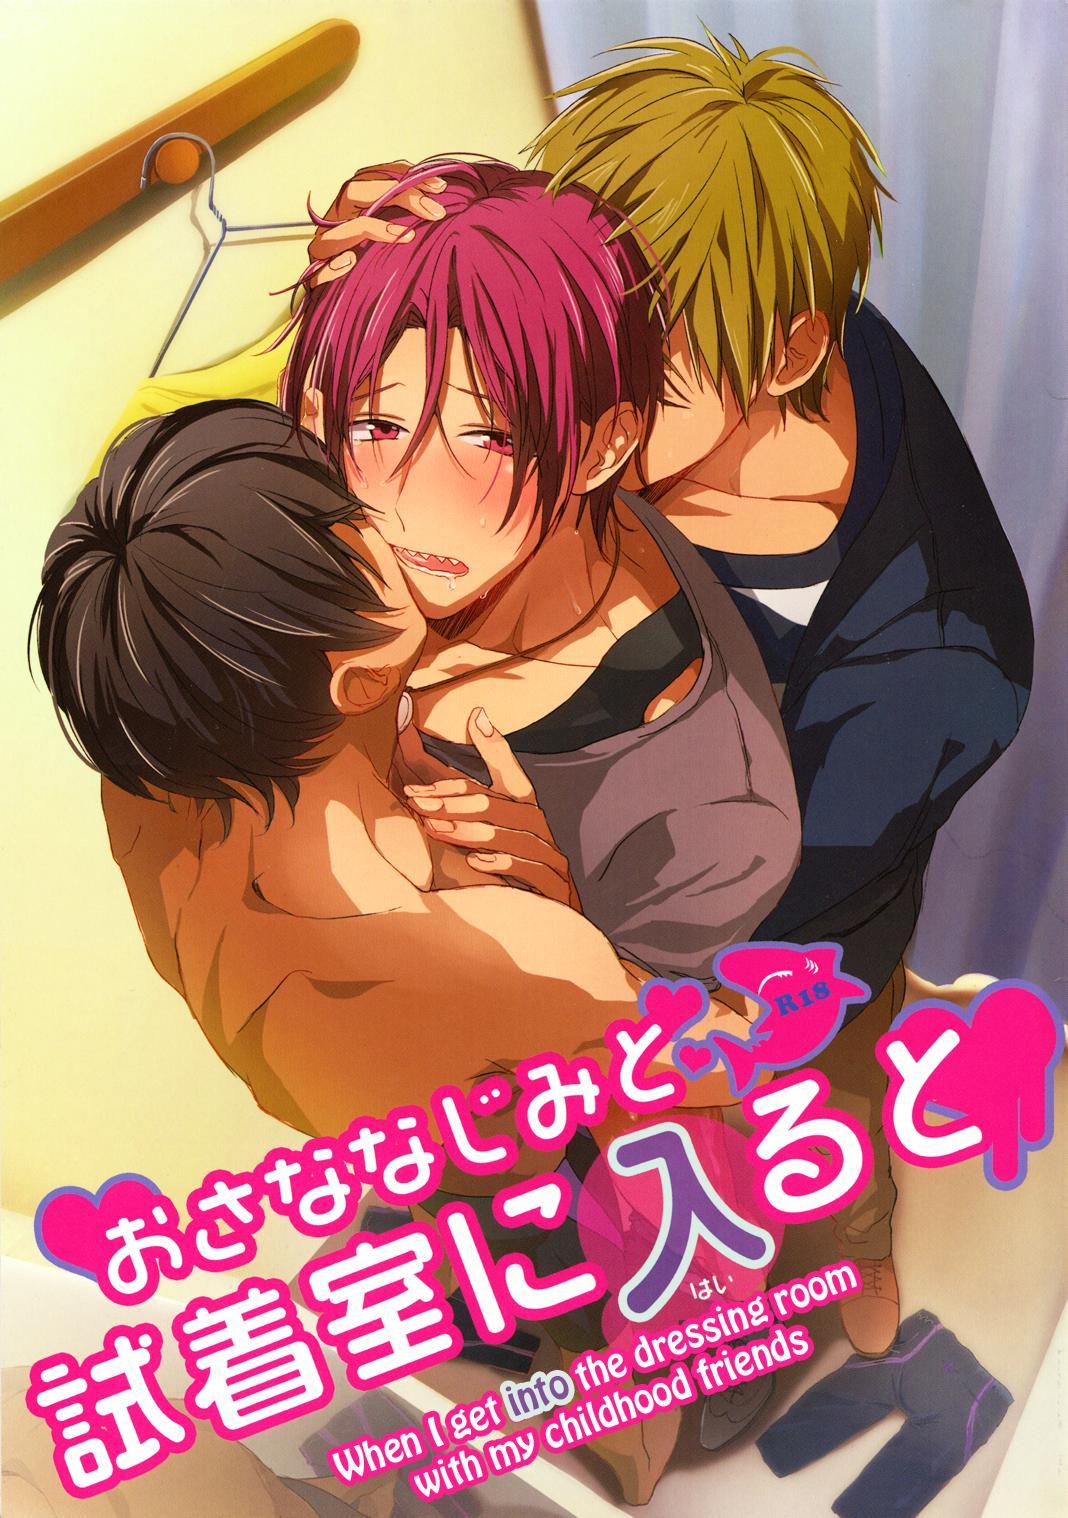 Osananajimi to Shichakushitsu ni Hairu to | When I Get Into The Dressing Room With My Childhood Friends 0